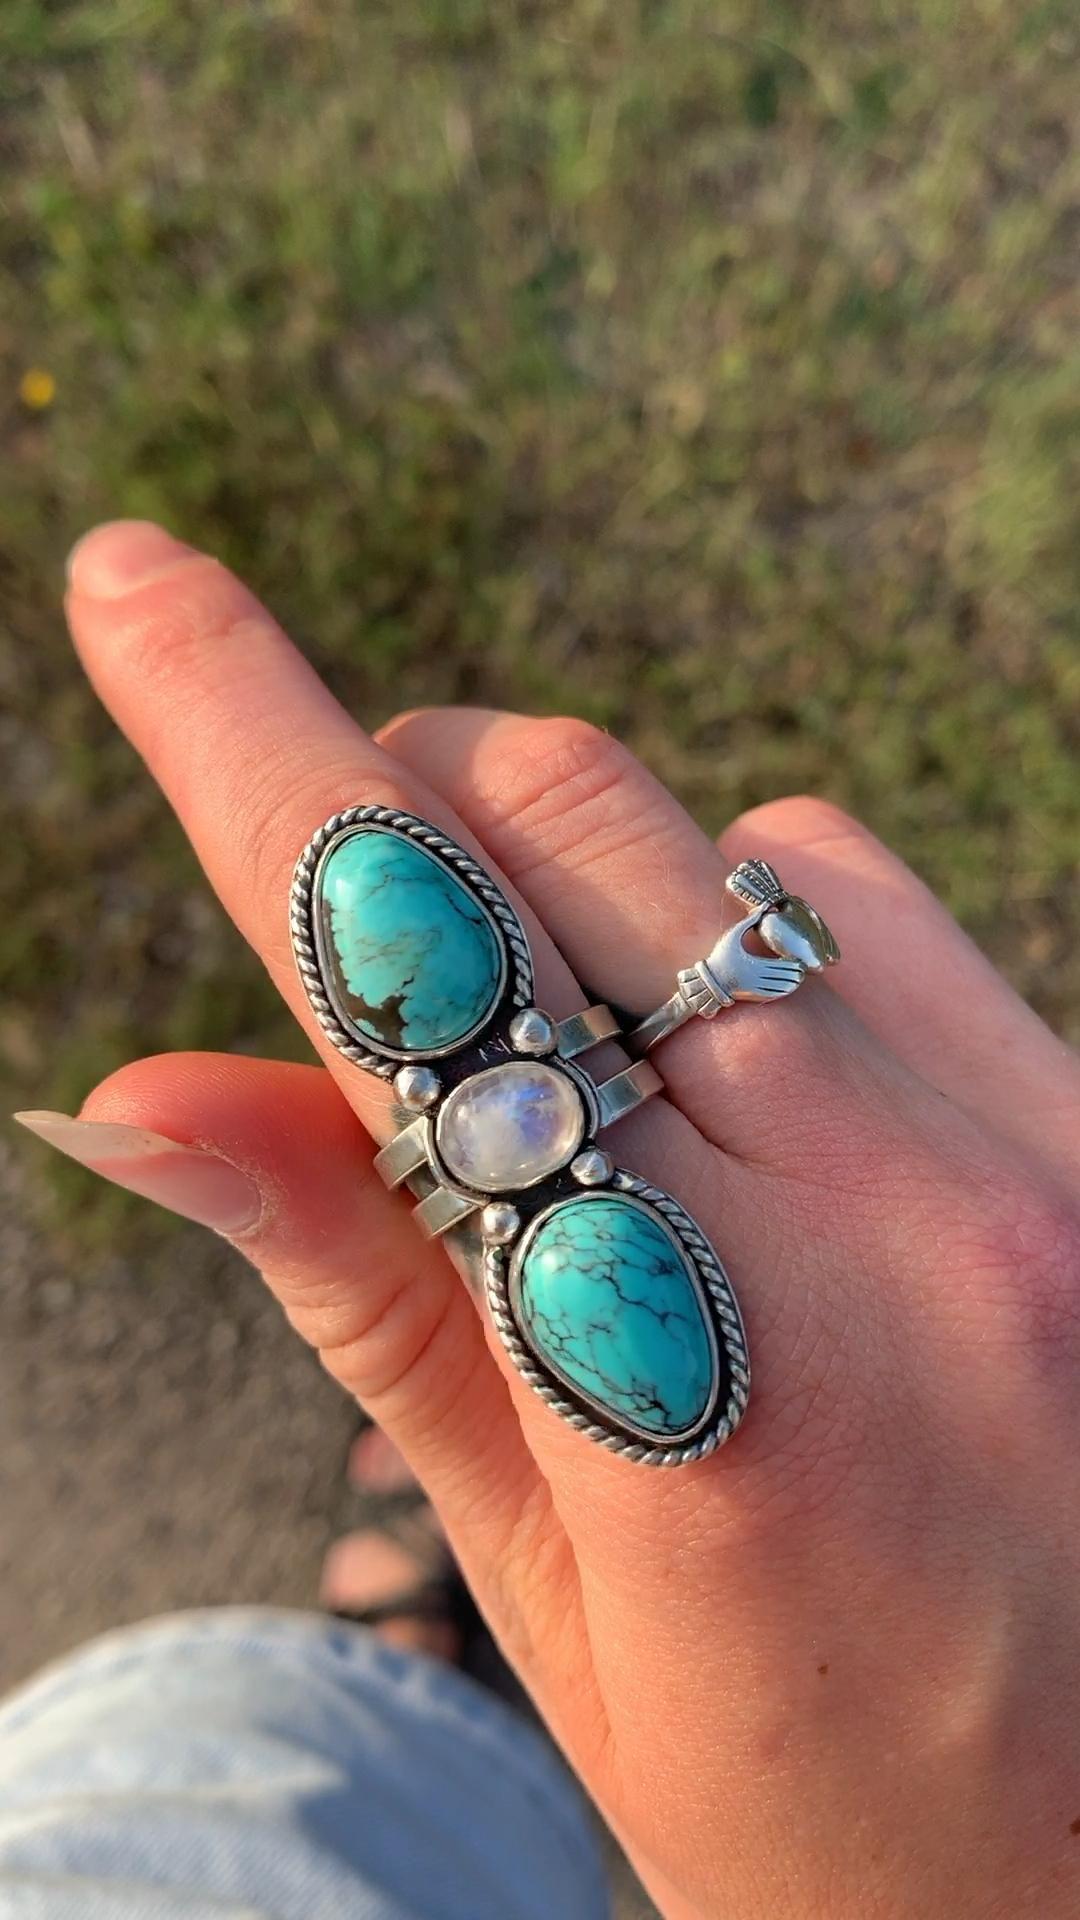 Blue Moon Turquoise & Moonstone statement ring size 8 available #statementjewelry #turquoisejewelry #moonstone #moonstonering